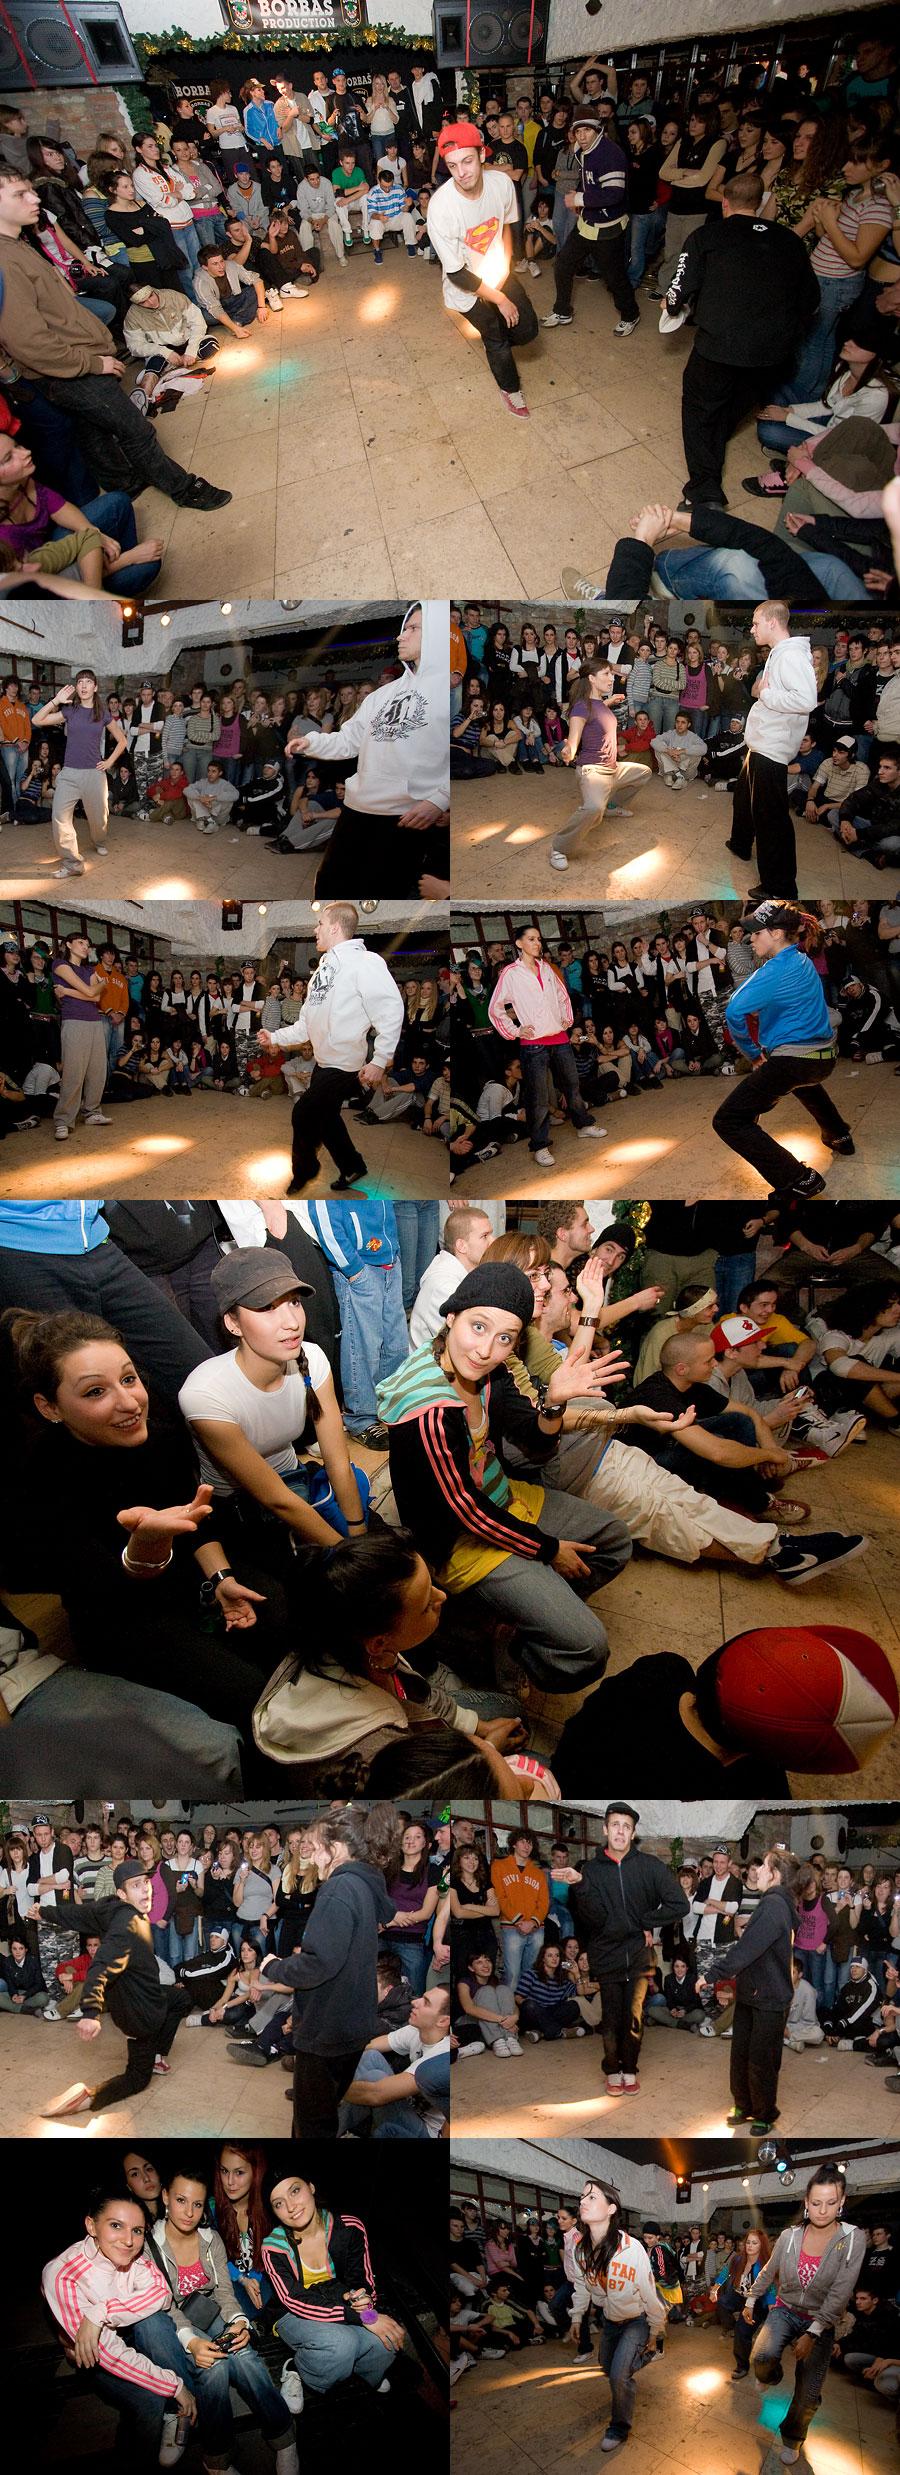 Hip hop delight [kolaž]  Foto: steam  Ključne riječi: hip_hop